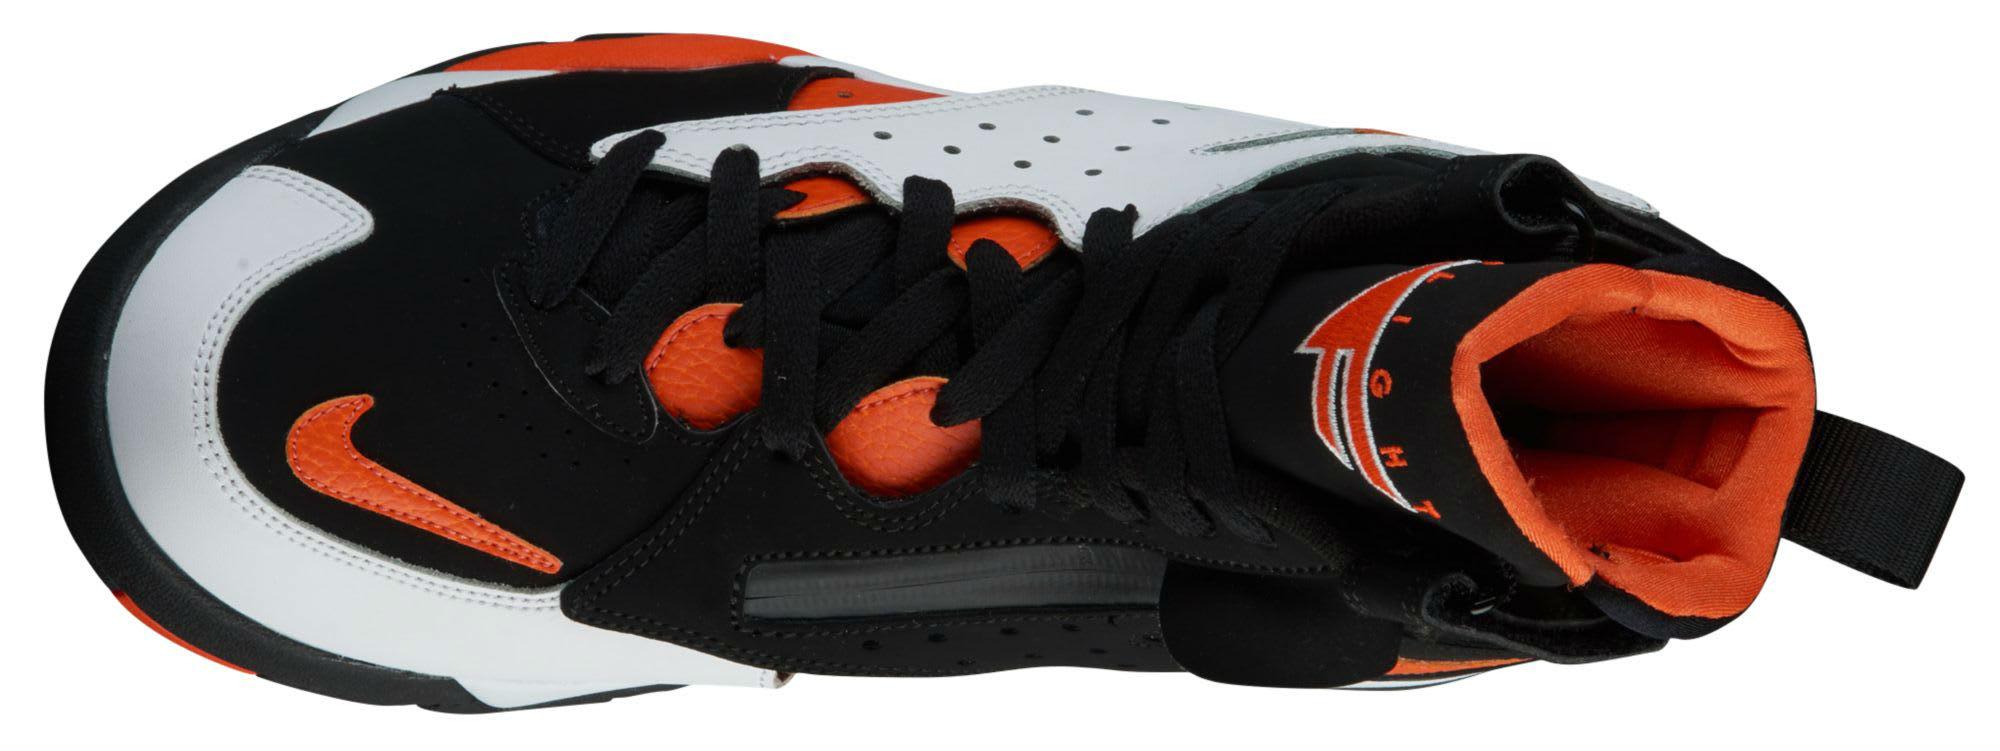 acc9db9acd6f ... Best Wholesaler Nike Air Maestro 2 LTD Rush Orange Release Date  AH8511-101 Top ...